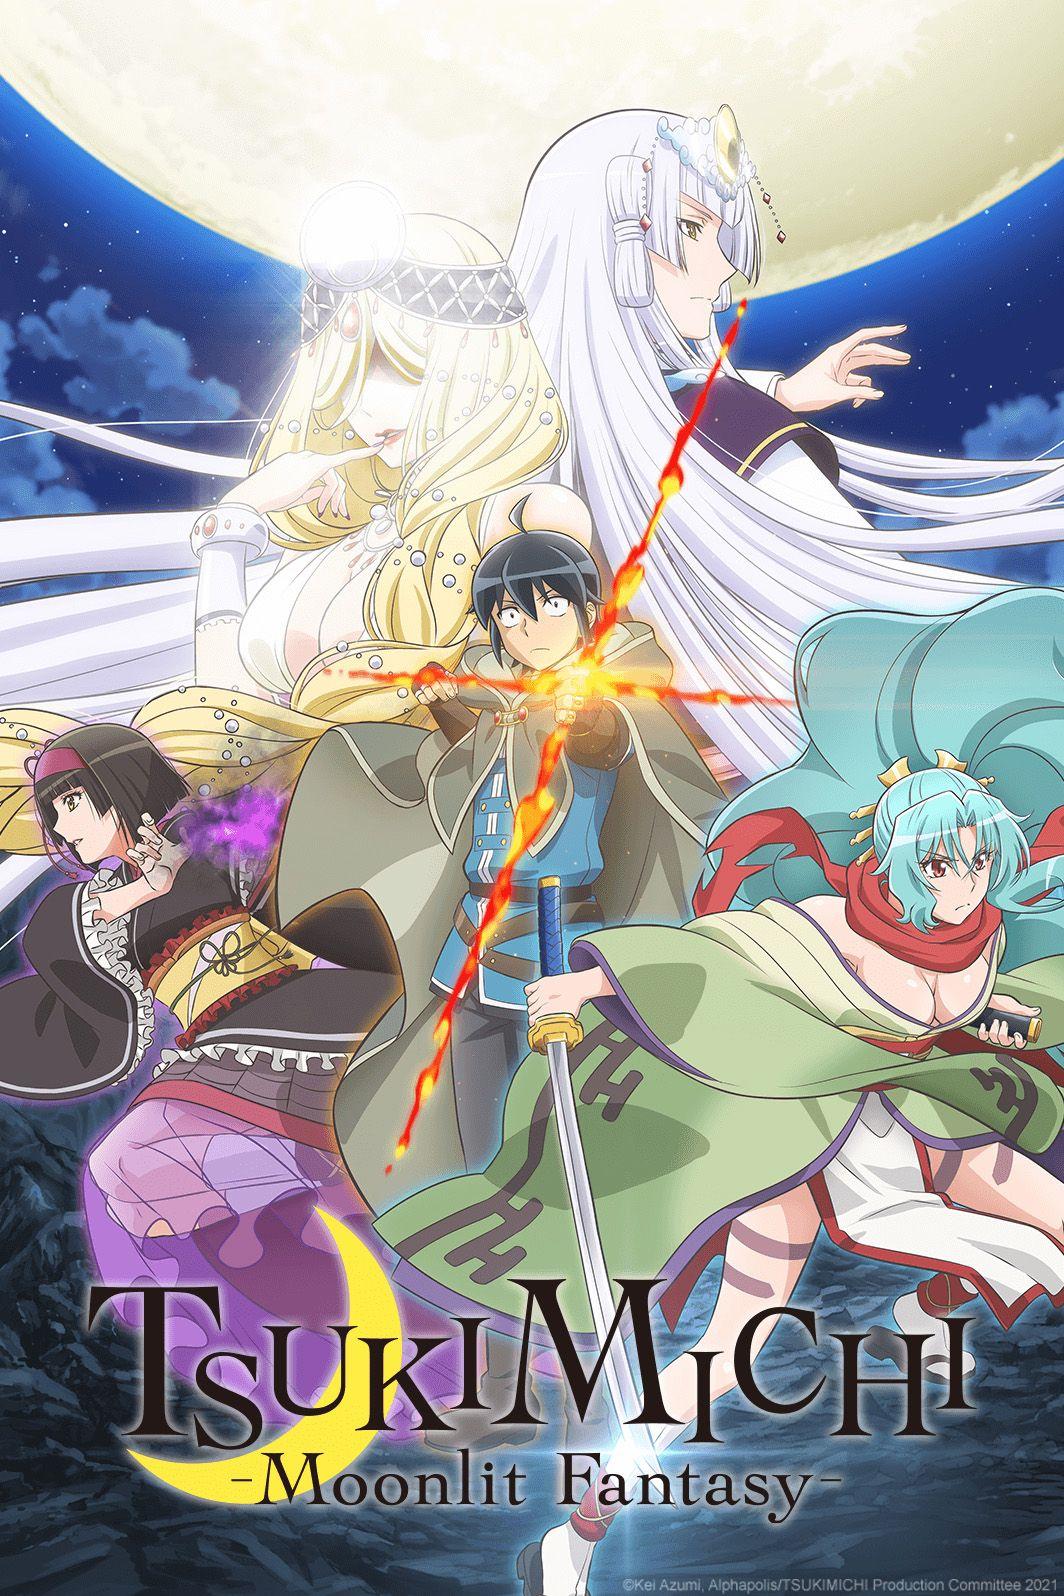 Tsukimichi - Moonlit Fantasy